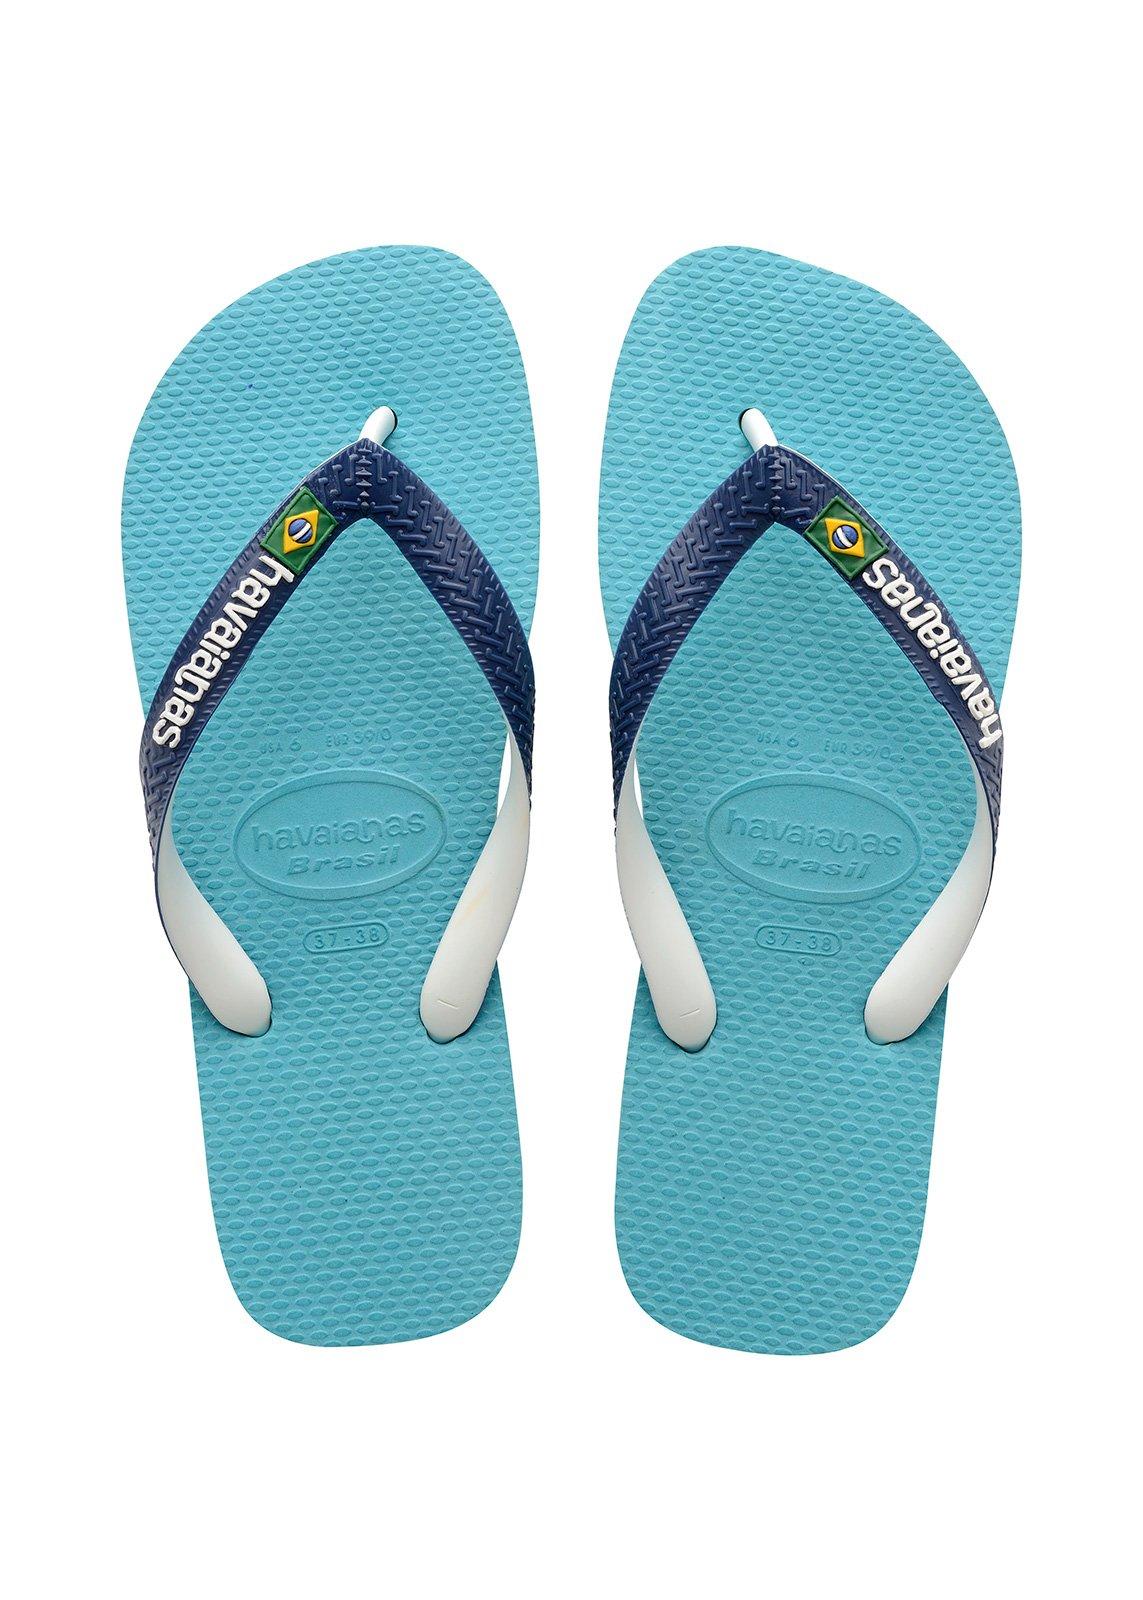 2c94294a7f5c Flip-Flops Blue Flip Flops - Havaianas Brasil Mix Blue